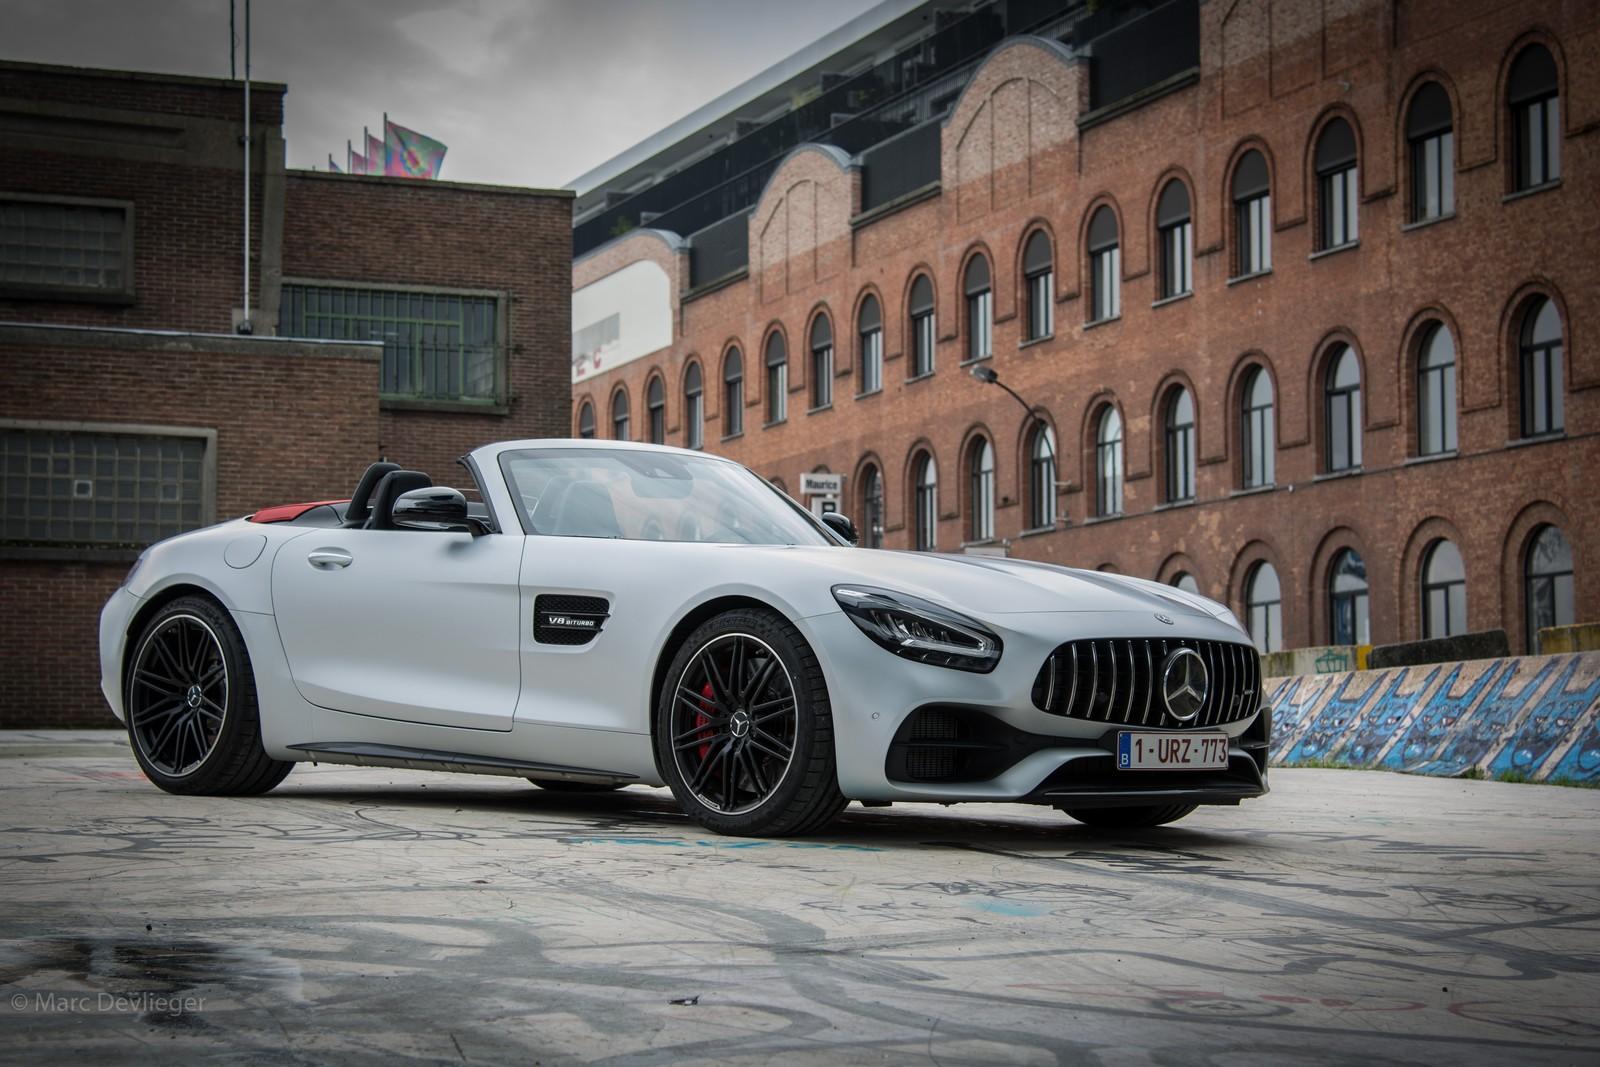 Mercedes-AMG GT Roadster Specs